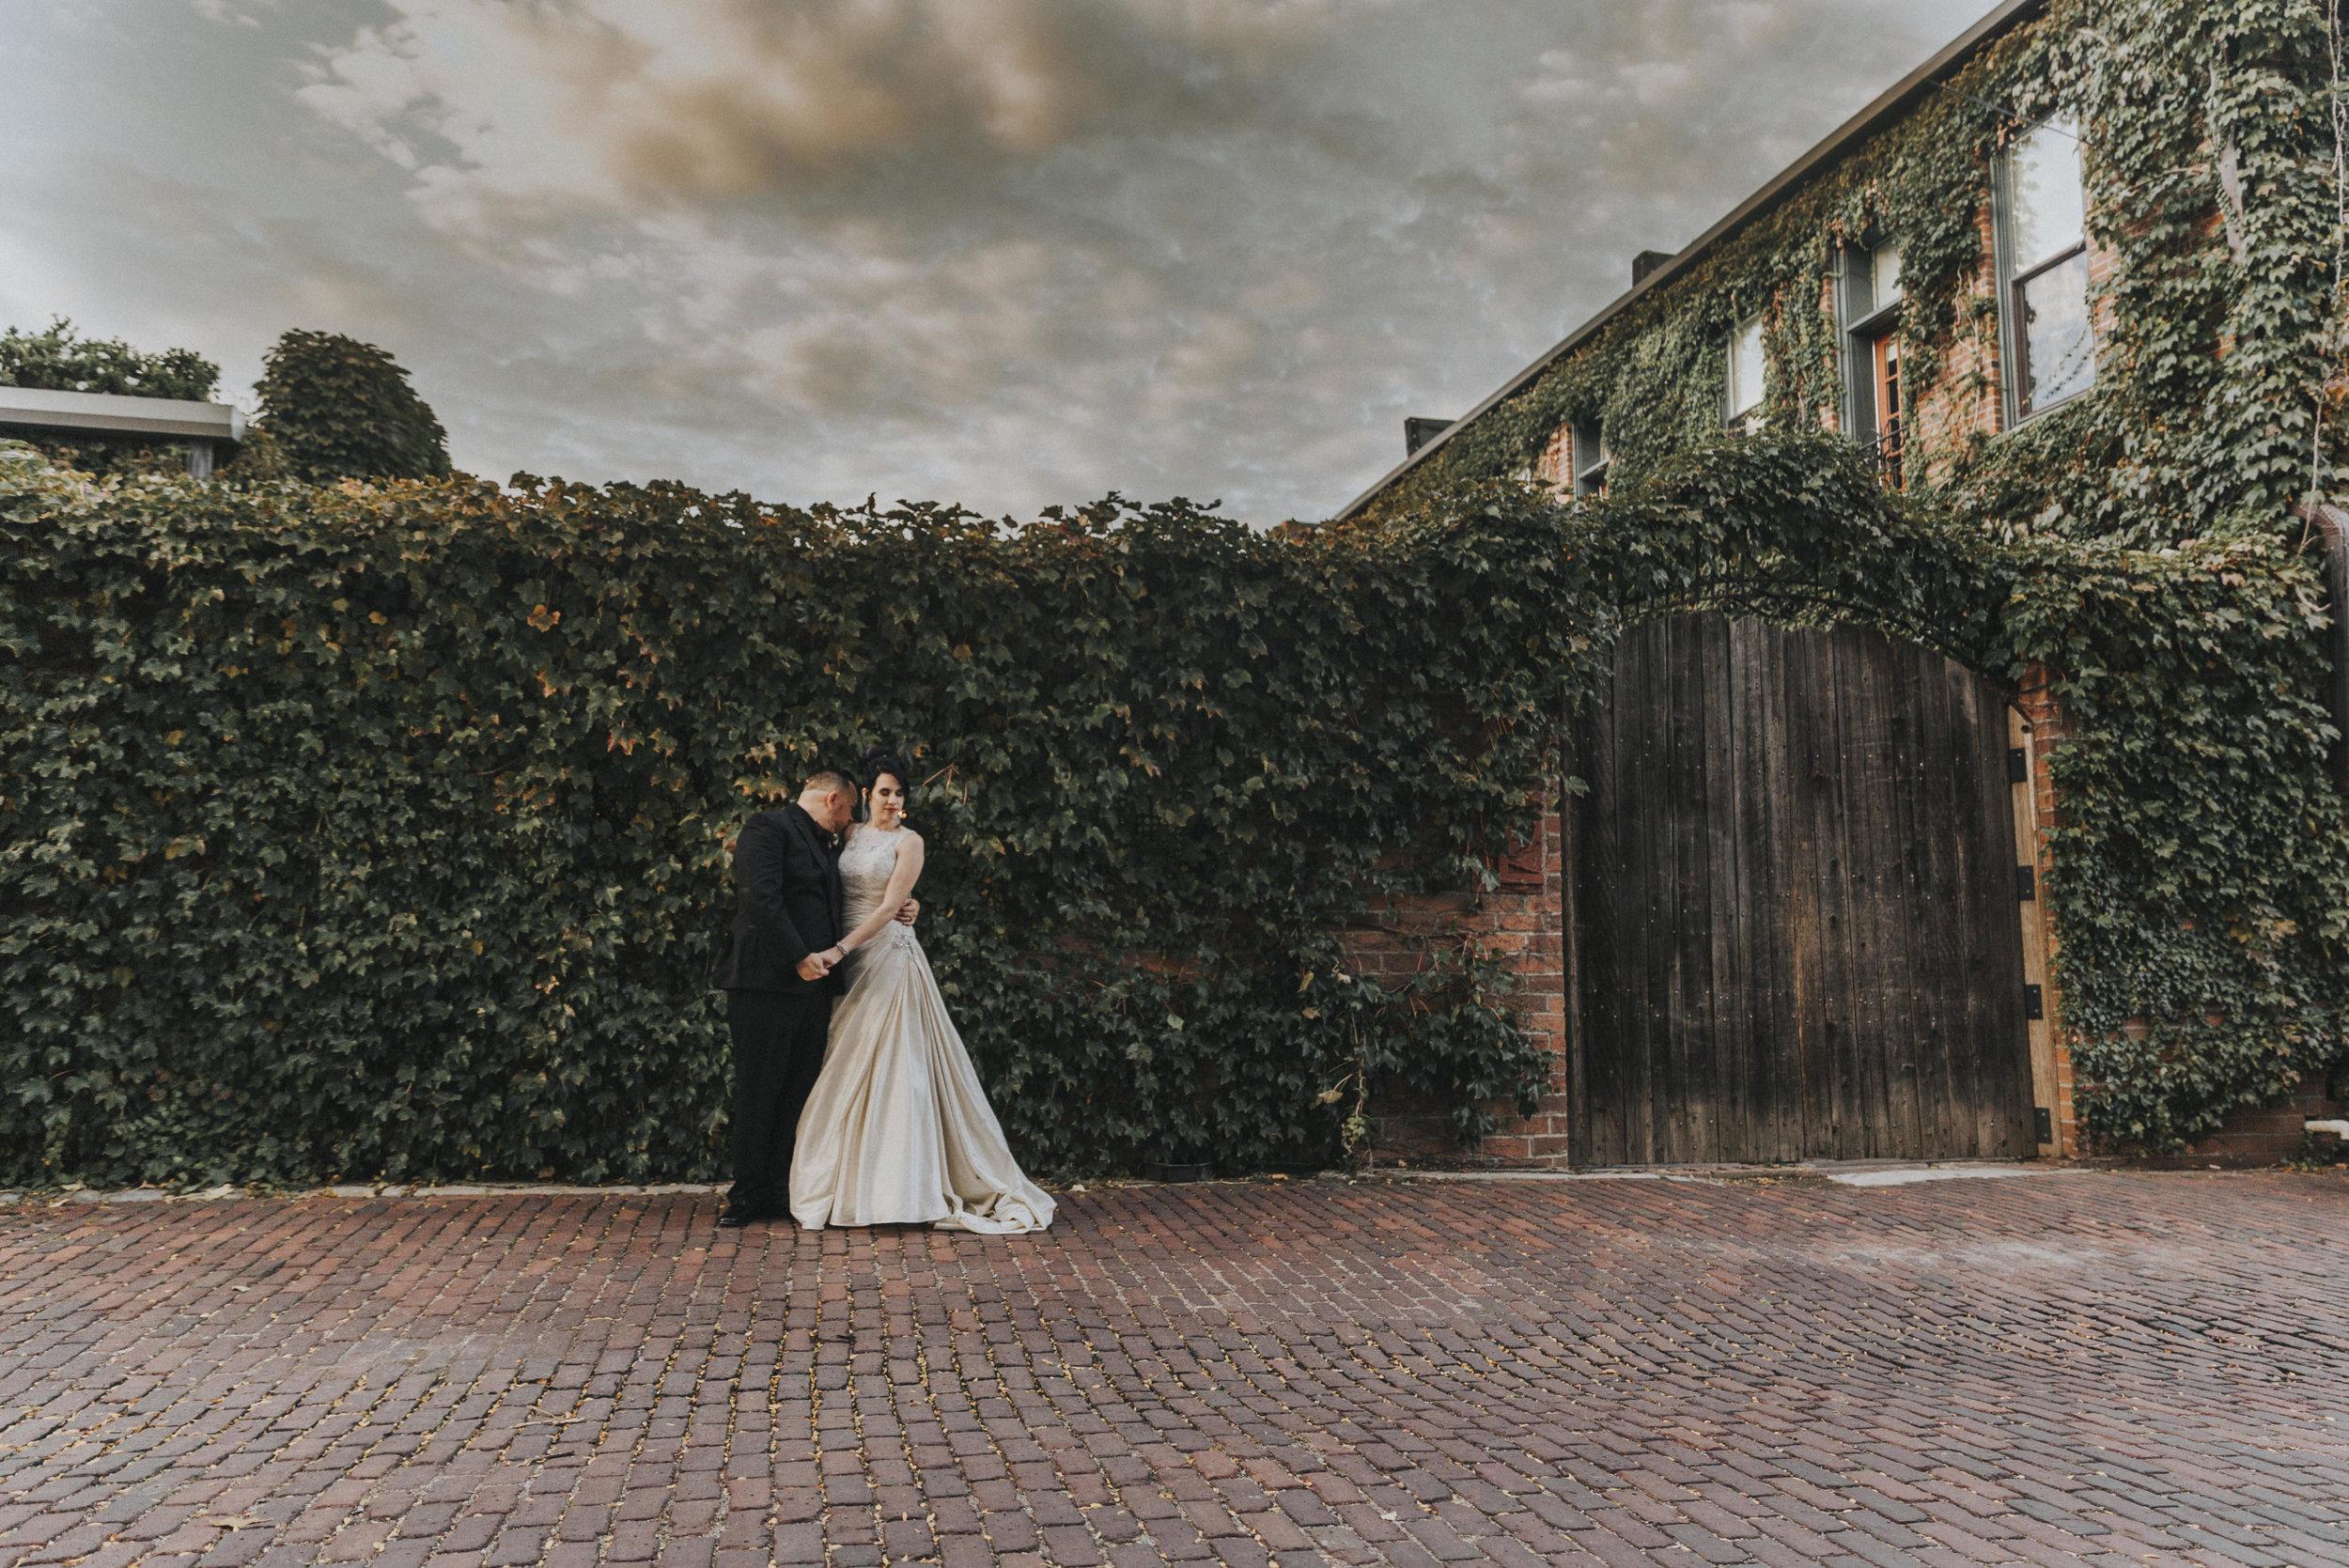 377 luciles- omaha-old-market-elopement-photography.jpg